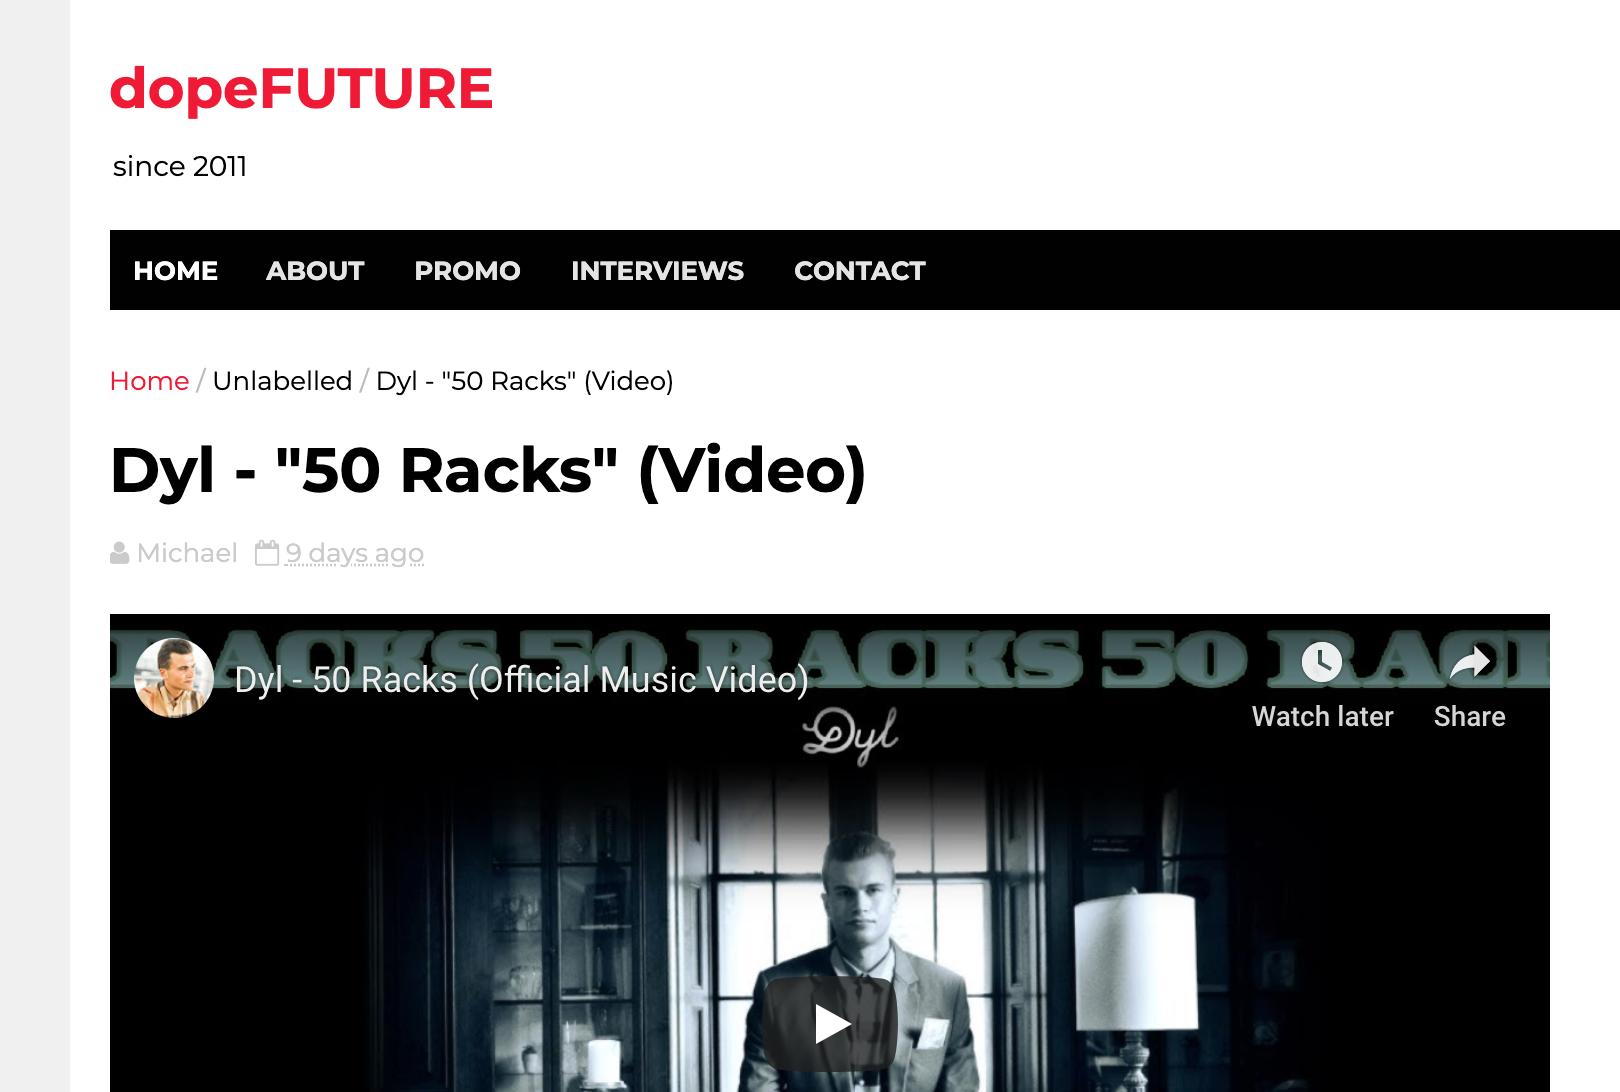 Dyl - 50 Racks DopeFuture